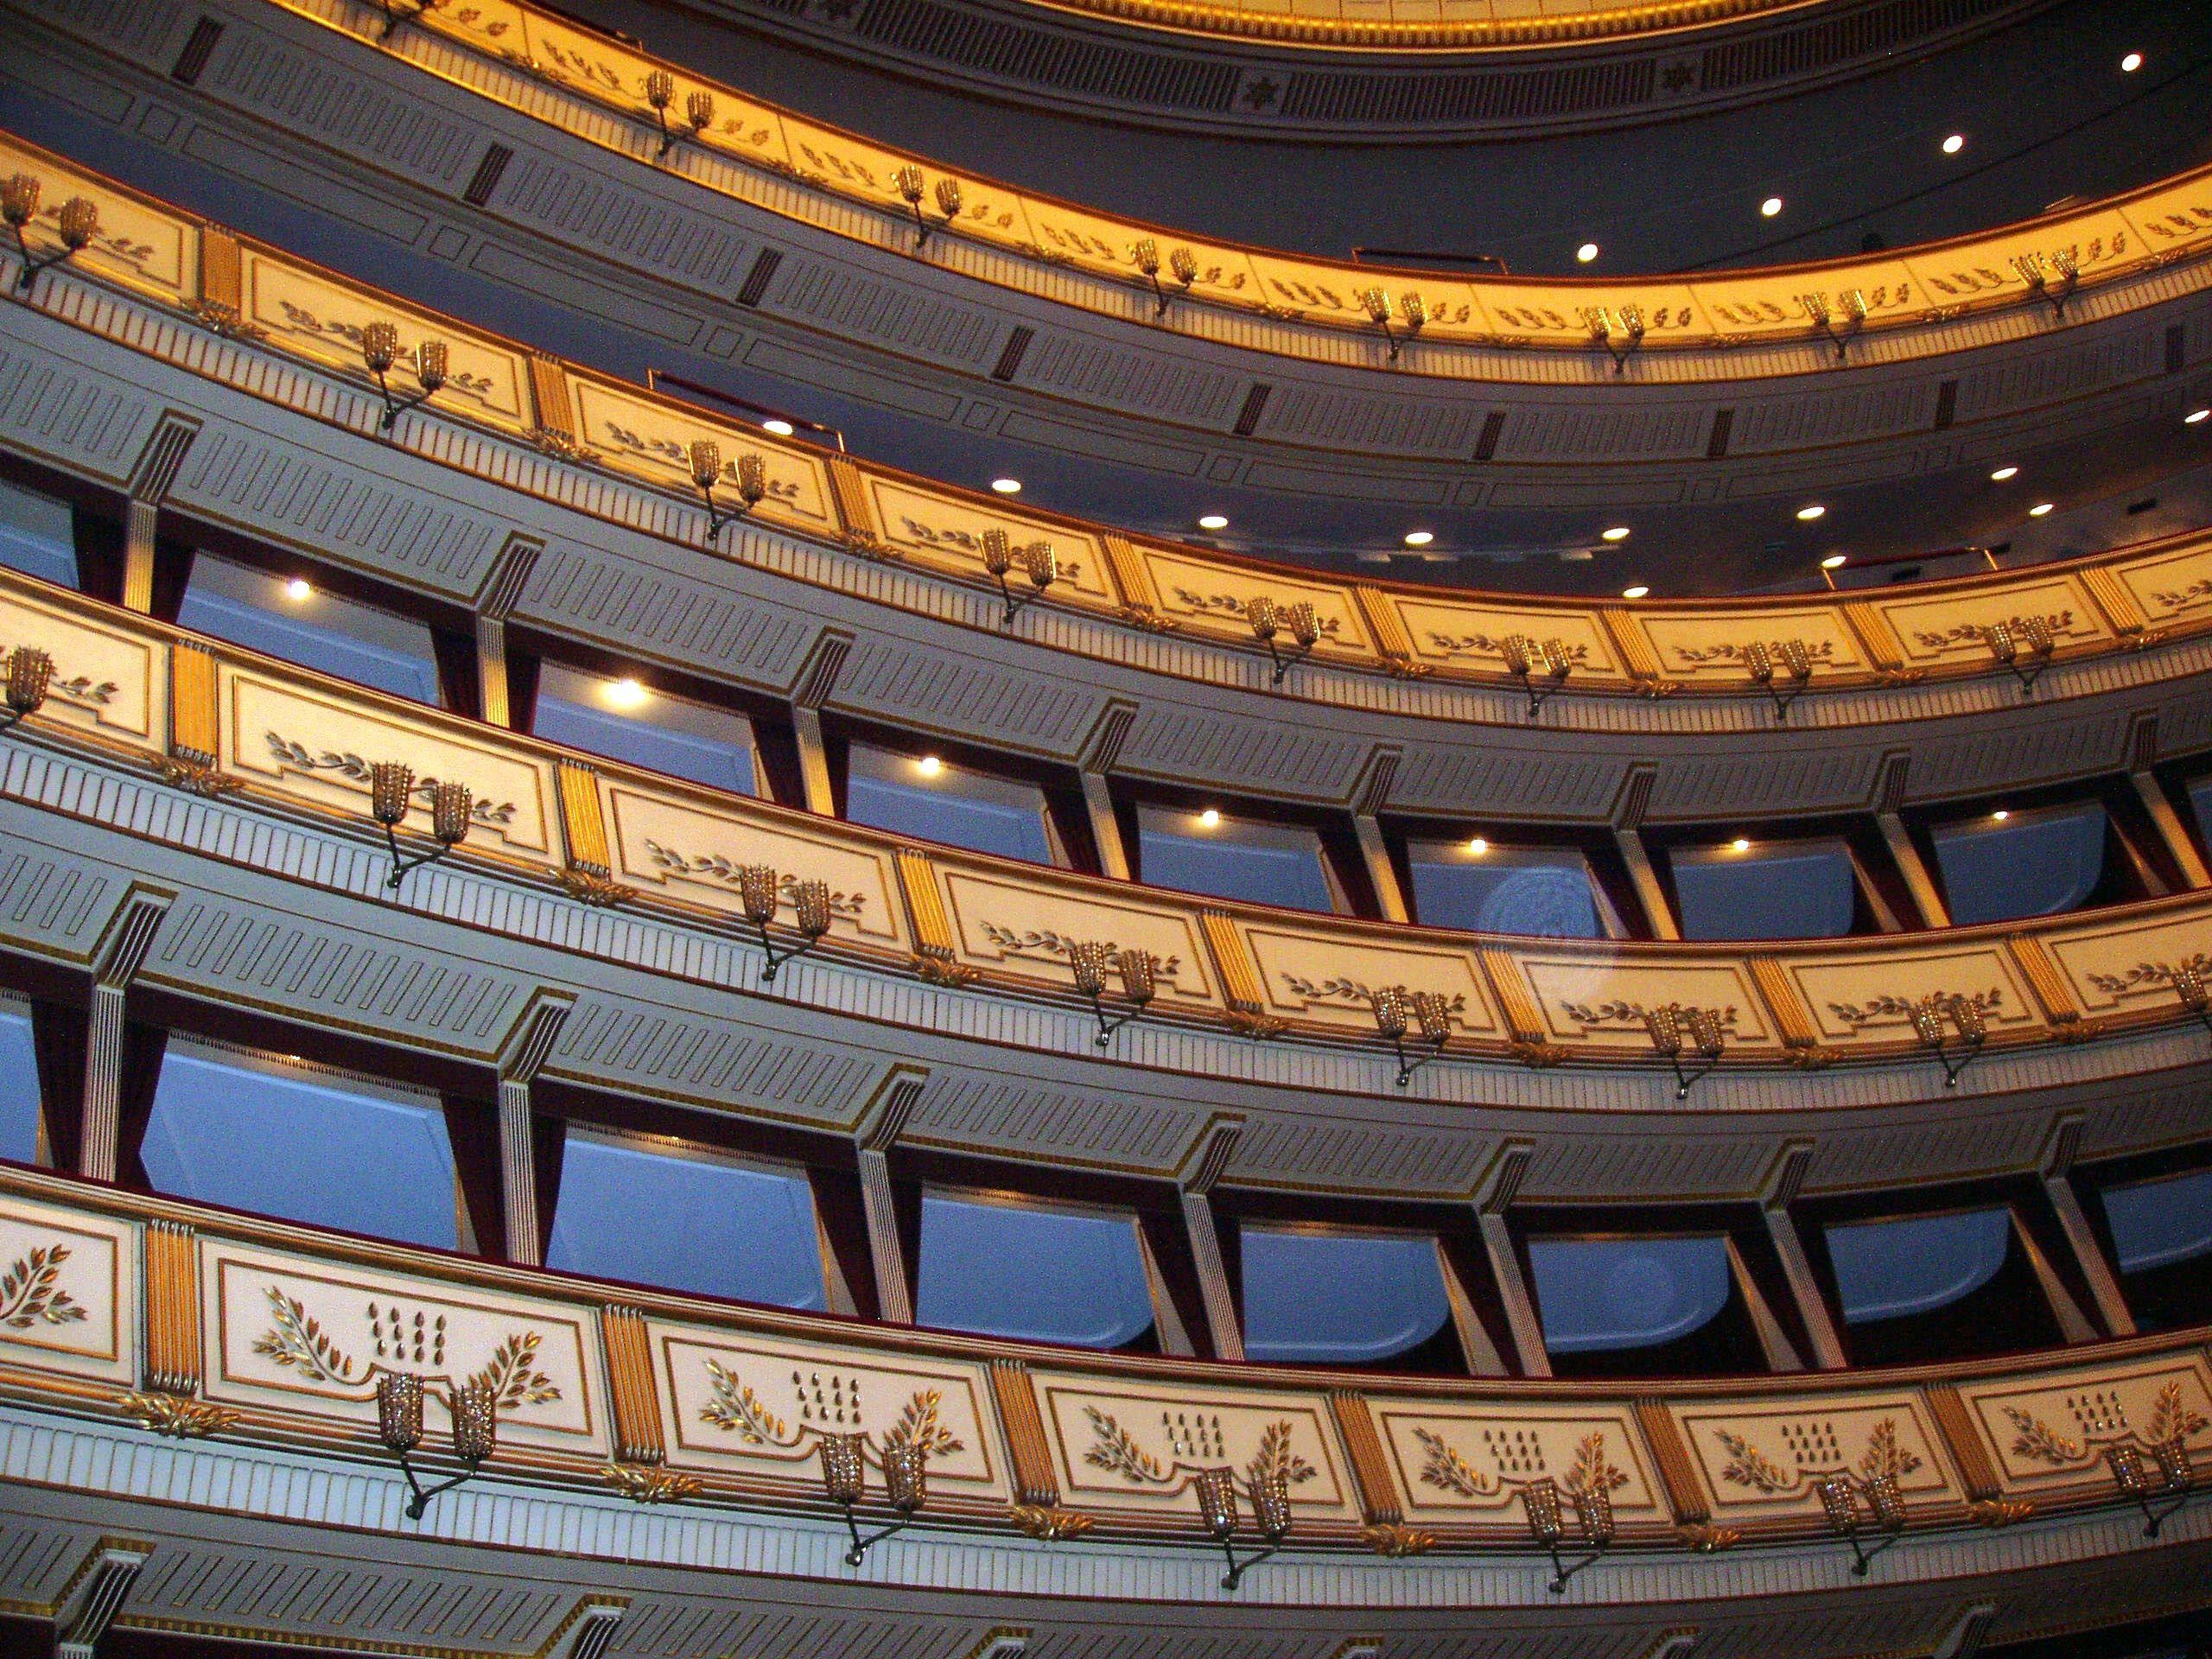 Opera house in Vienna. (Photo by Jim Uszler)